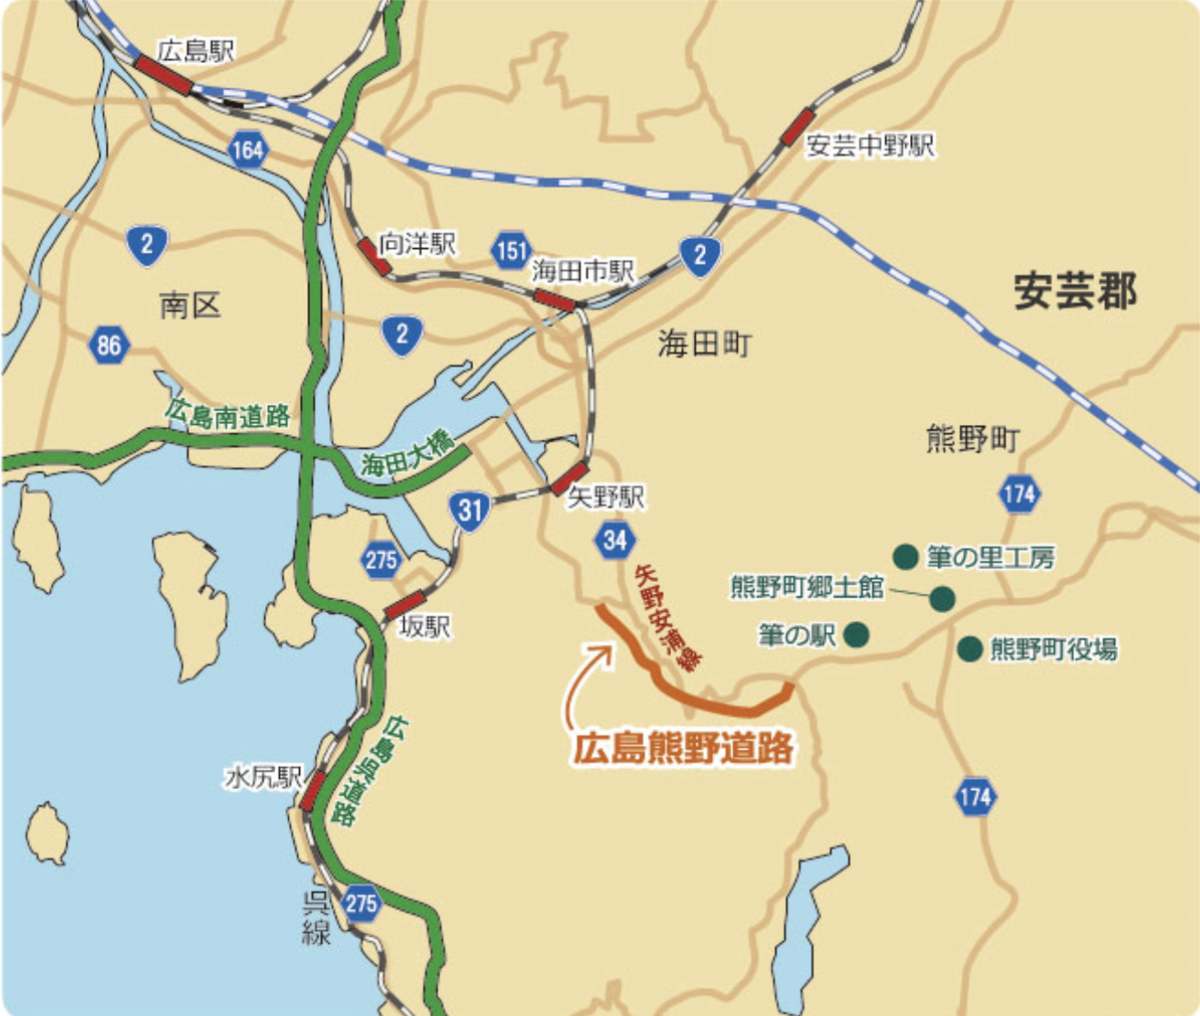 f:id:zakiyamatakashi:20201207212352p:plain